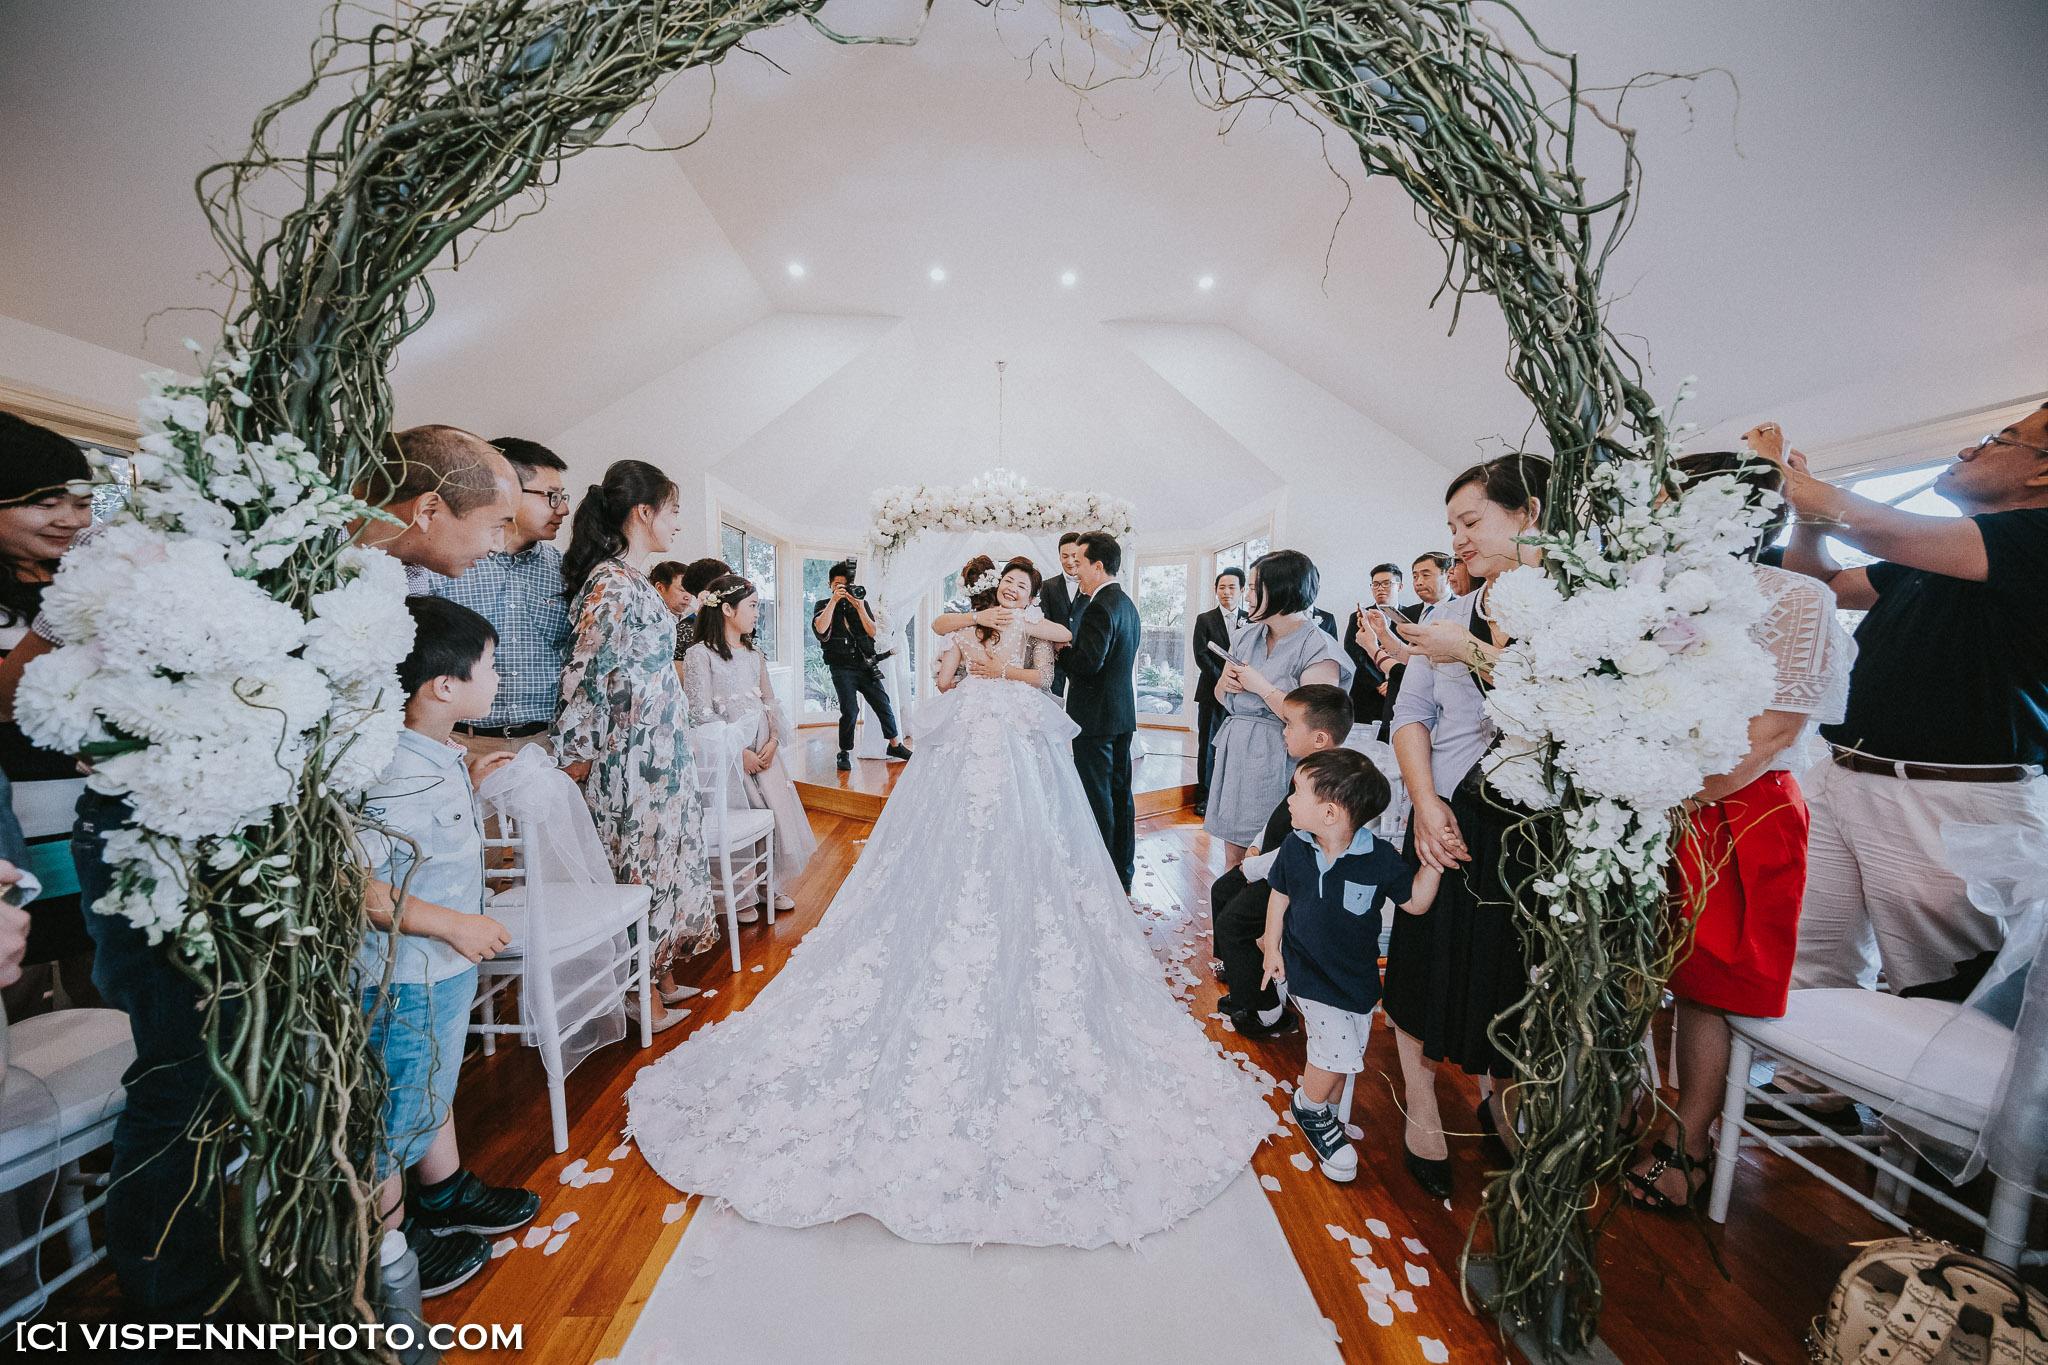 WEDDING DAY Photography Melbourne VISPENN 墨尔本 婚礼跟拍 婚礼摄像 婚礼摄影 结婚照 登记照 VISPENN H4 0138